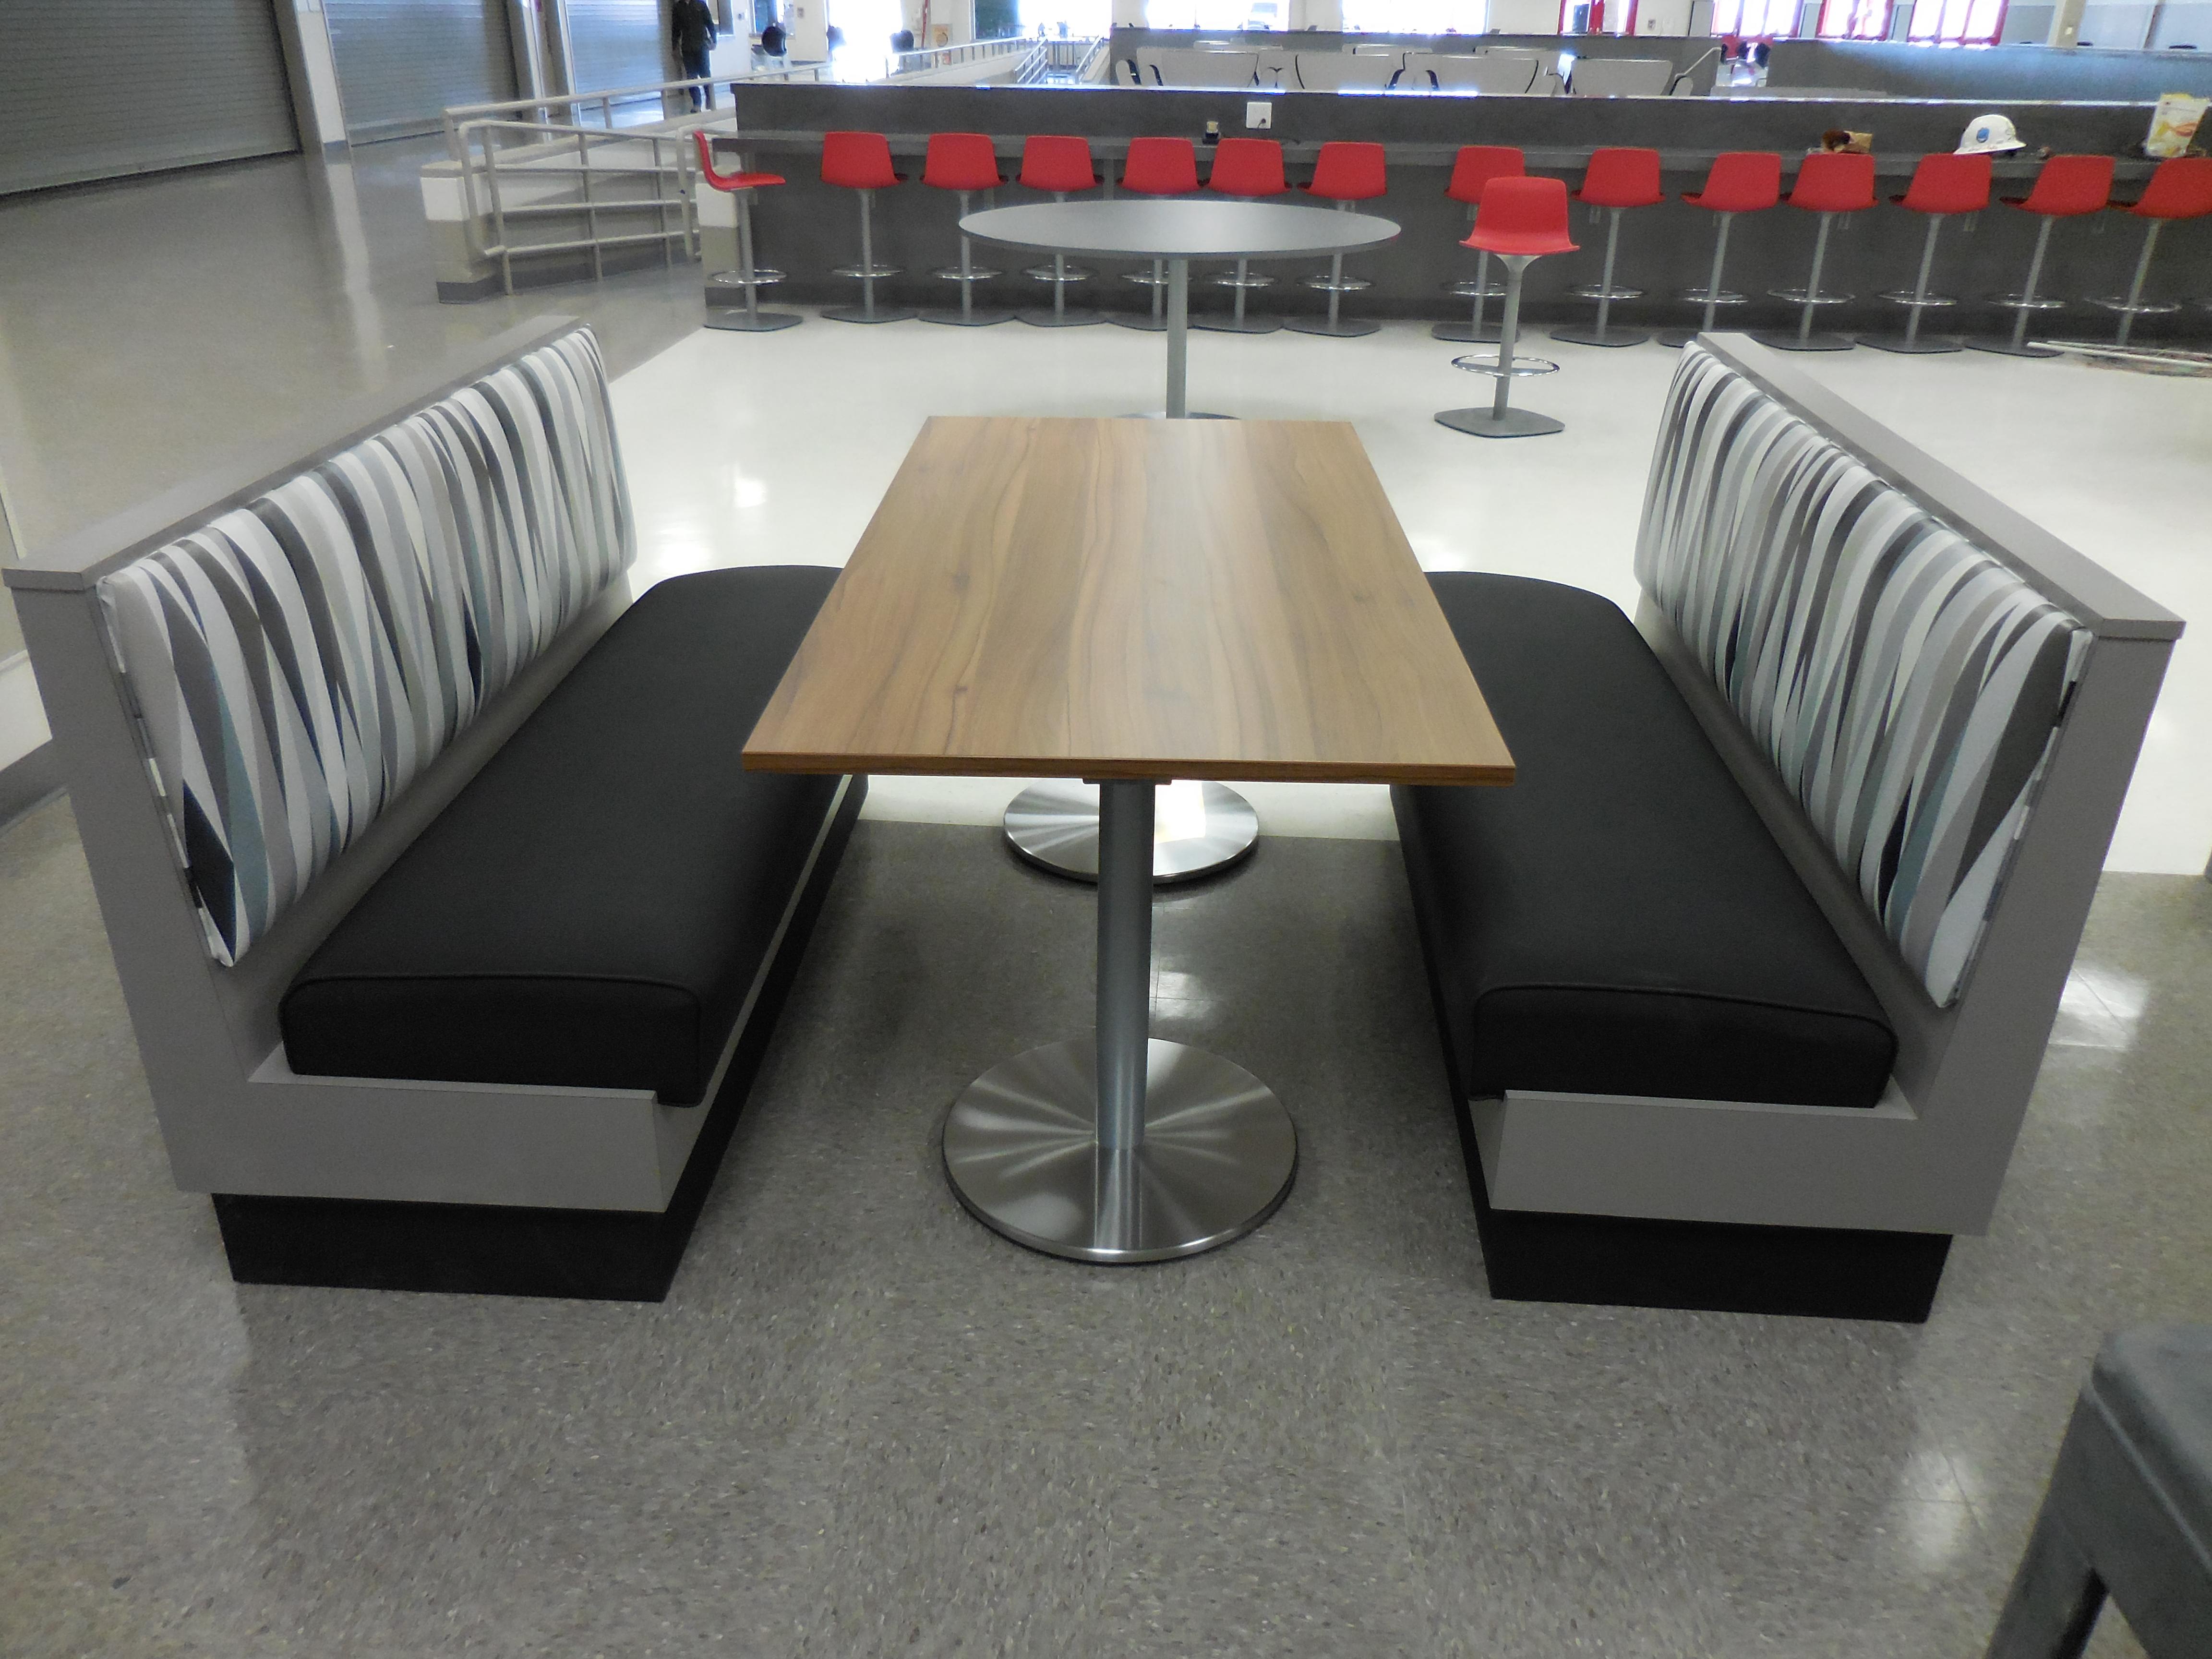 School Facilities And Classroom Furniture Worthington Contract Furnitureworthington Contract